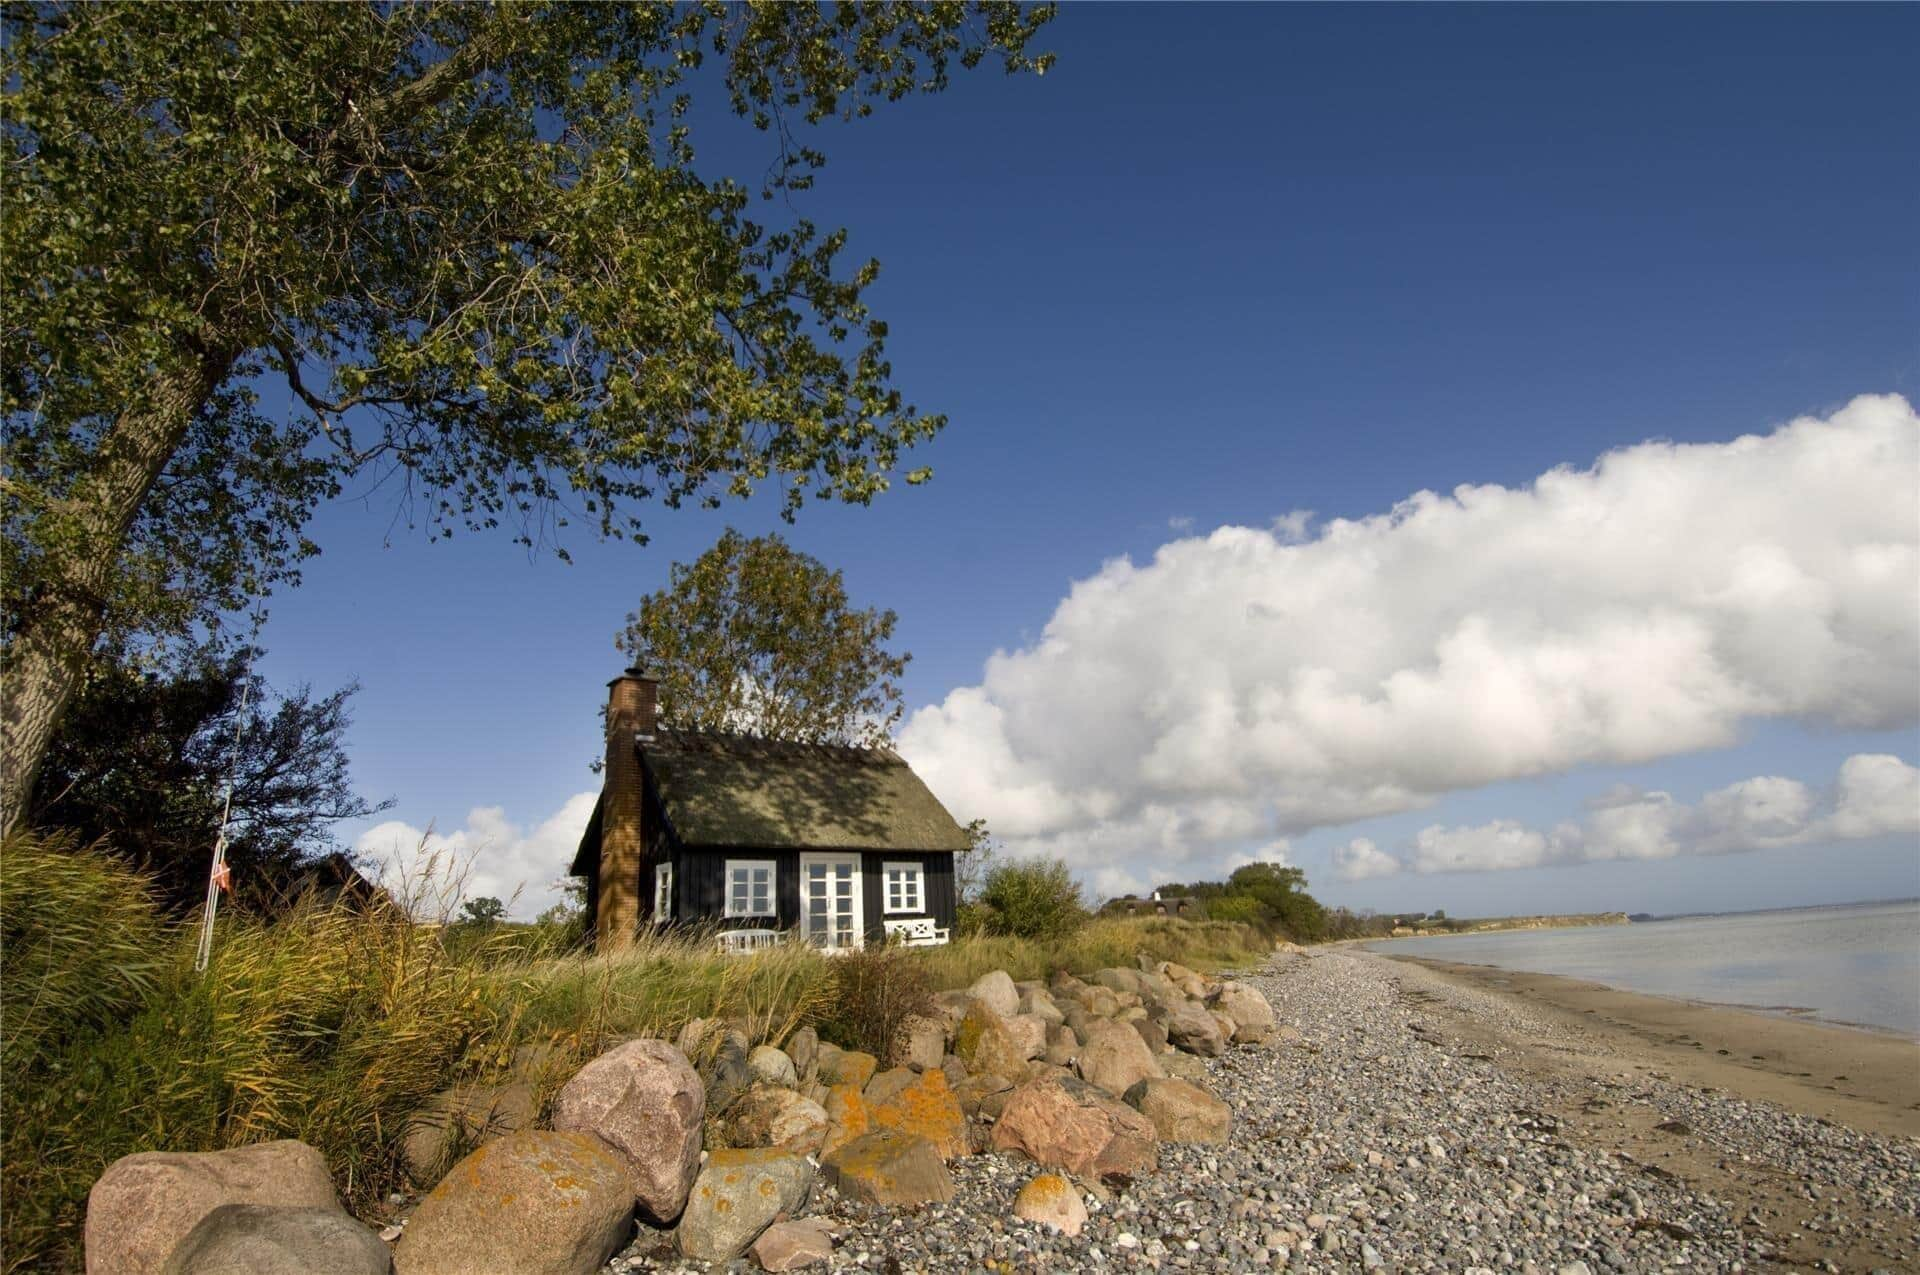 Billede 1-15 Sommerhus 6000, Rytsebækvej 37, DK - 4780 Stege